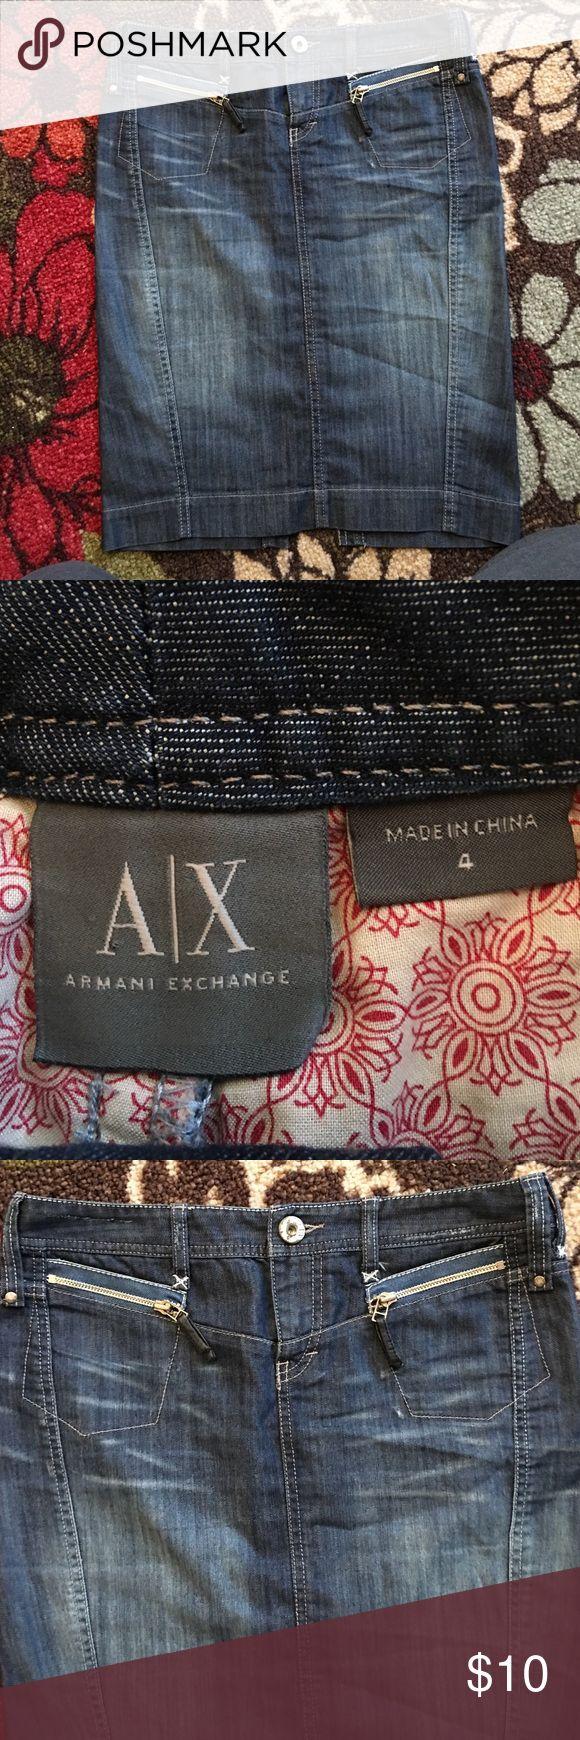 Size 4 Armani Exchange knee length denim skirt Size 4 Armani Exchange knee length denim skirt. Cotton/polyester/spandex so it has some stretch to it. Armani Exchange Skirts Midi